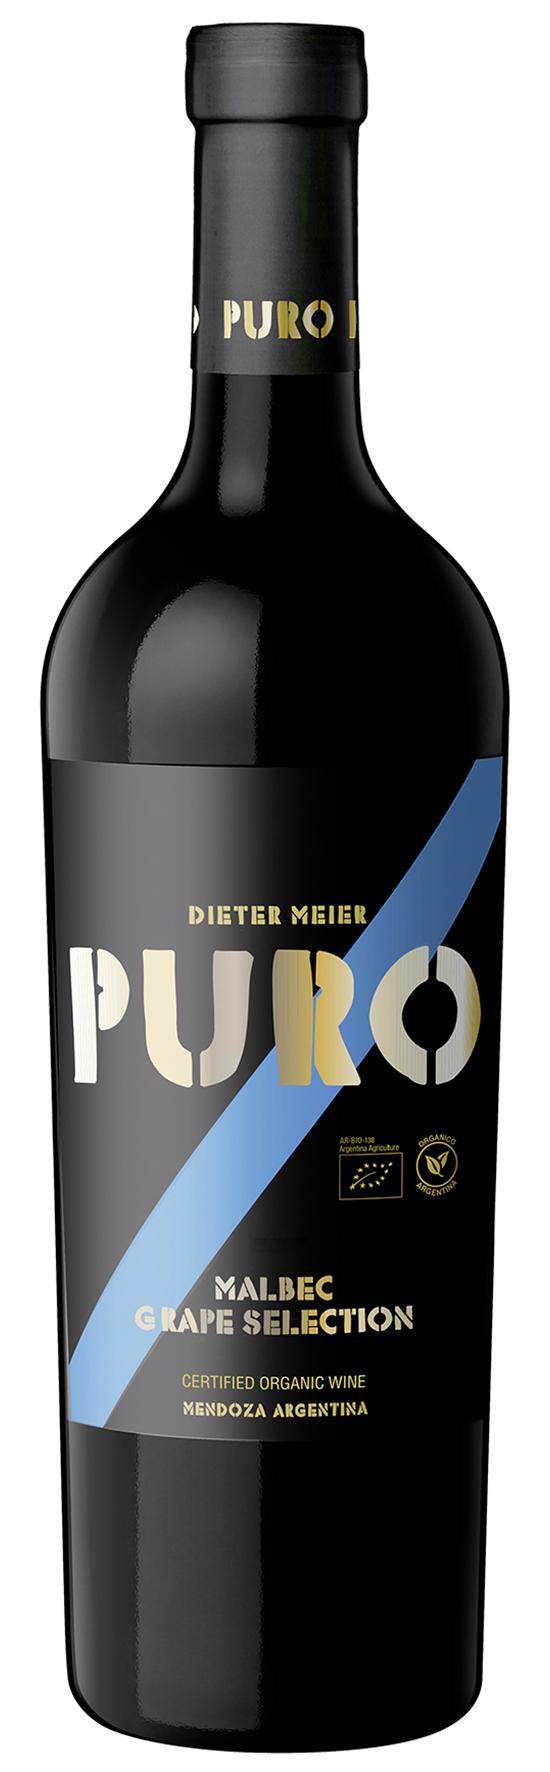 Puro Malbec Grape Selection 2018 BIO